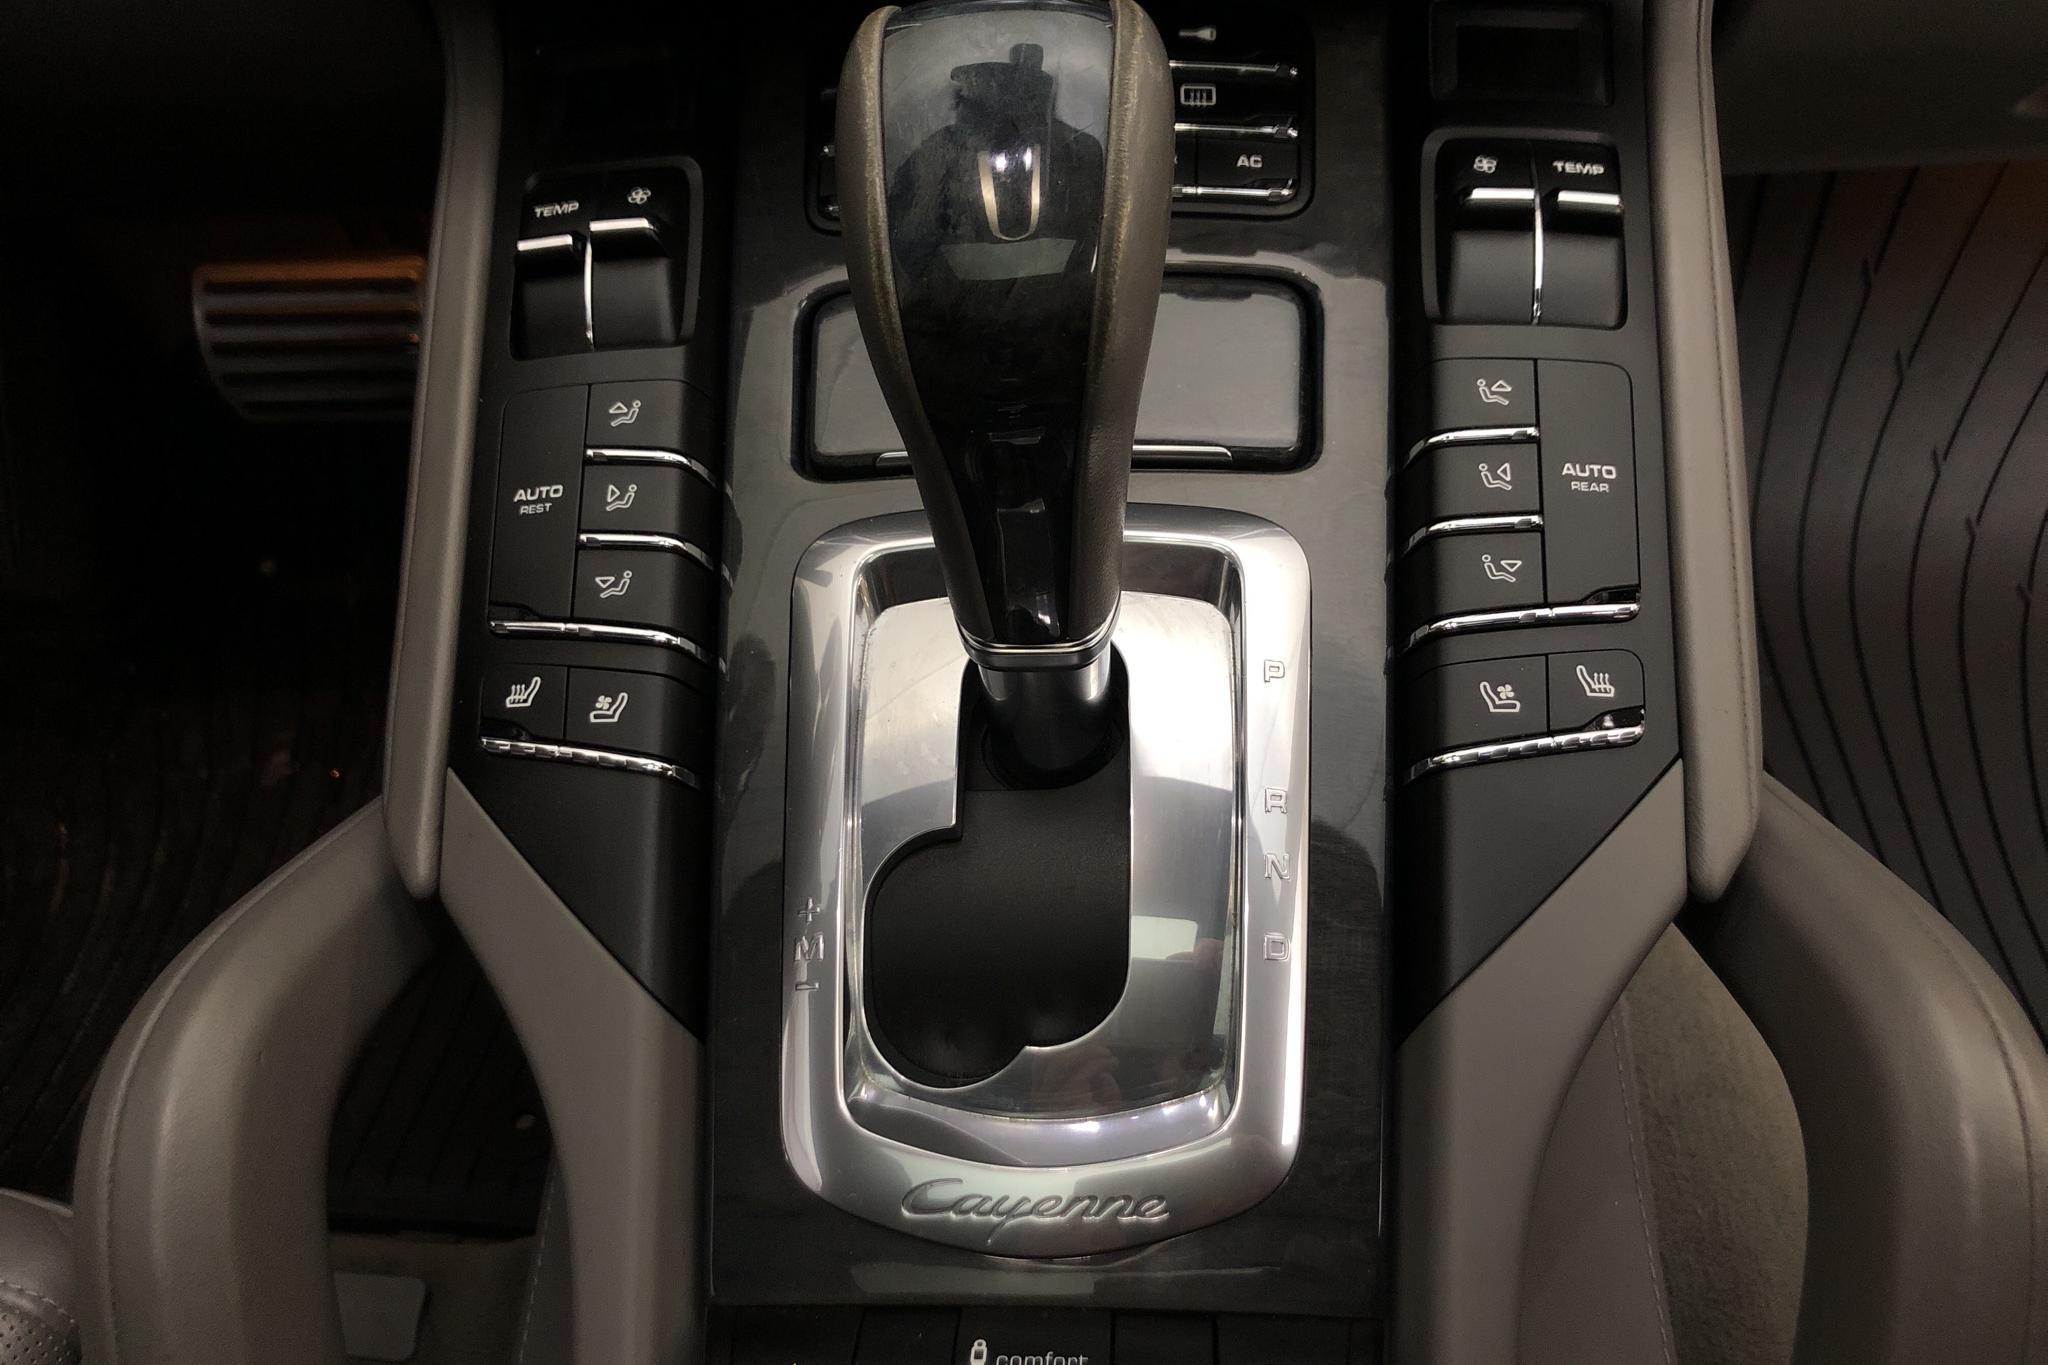 Porsche Cayenne 4.8 Turbo (500hk) - 89 030 km - Automatic - black - 2011